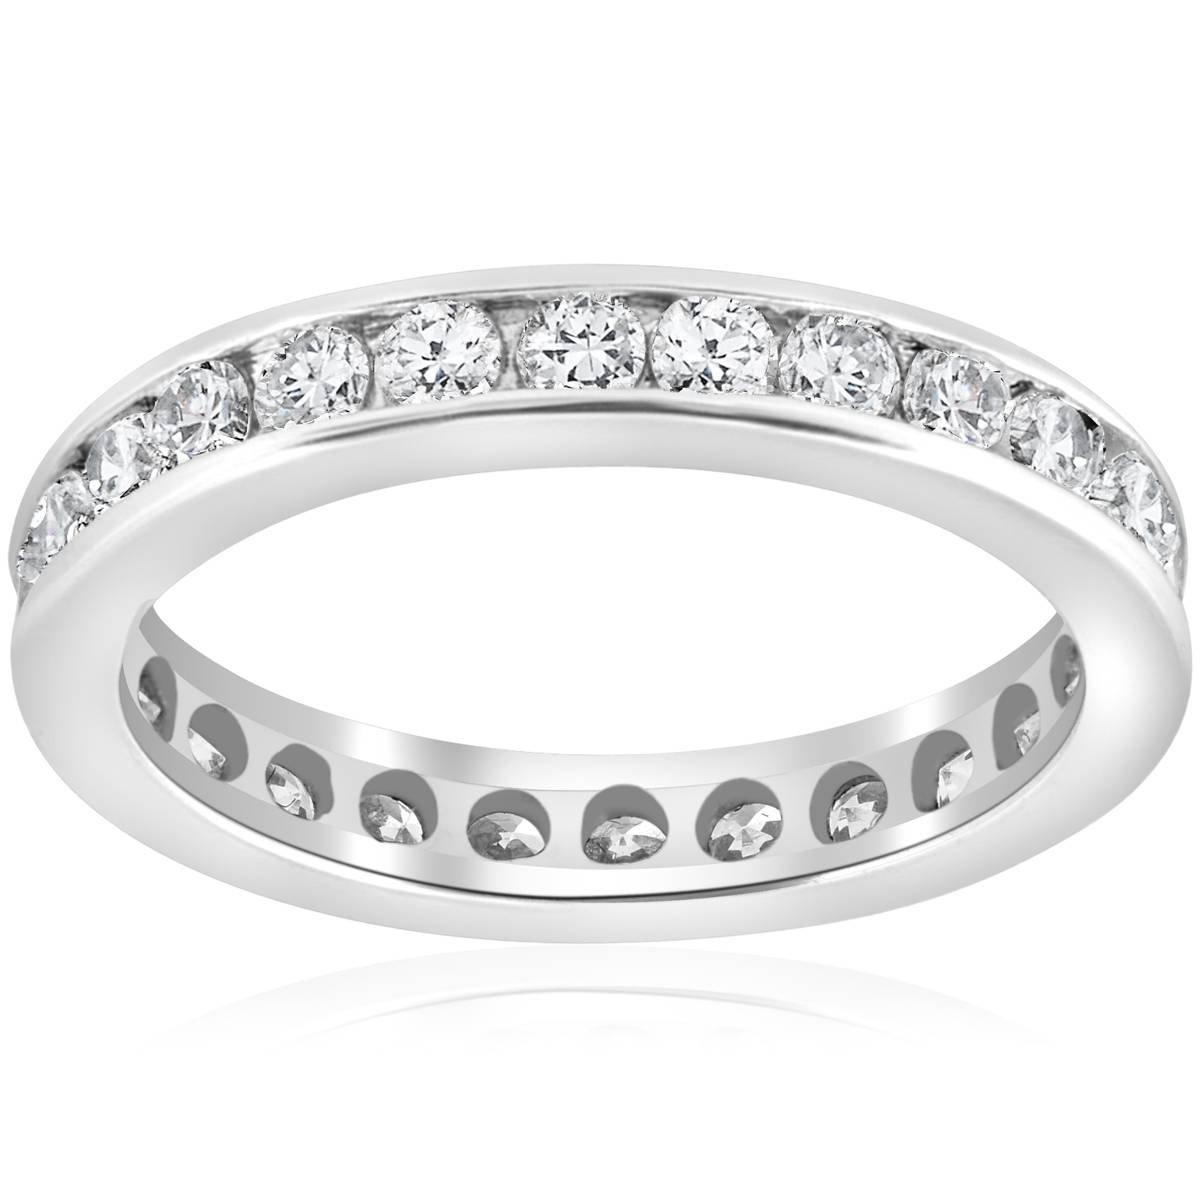 1 1/2ct Channel Set Diamond Eternity Ring 14K White Gold - Size 6.5